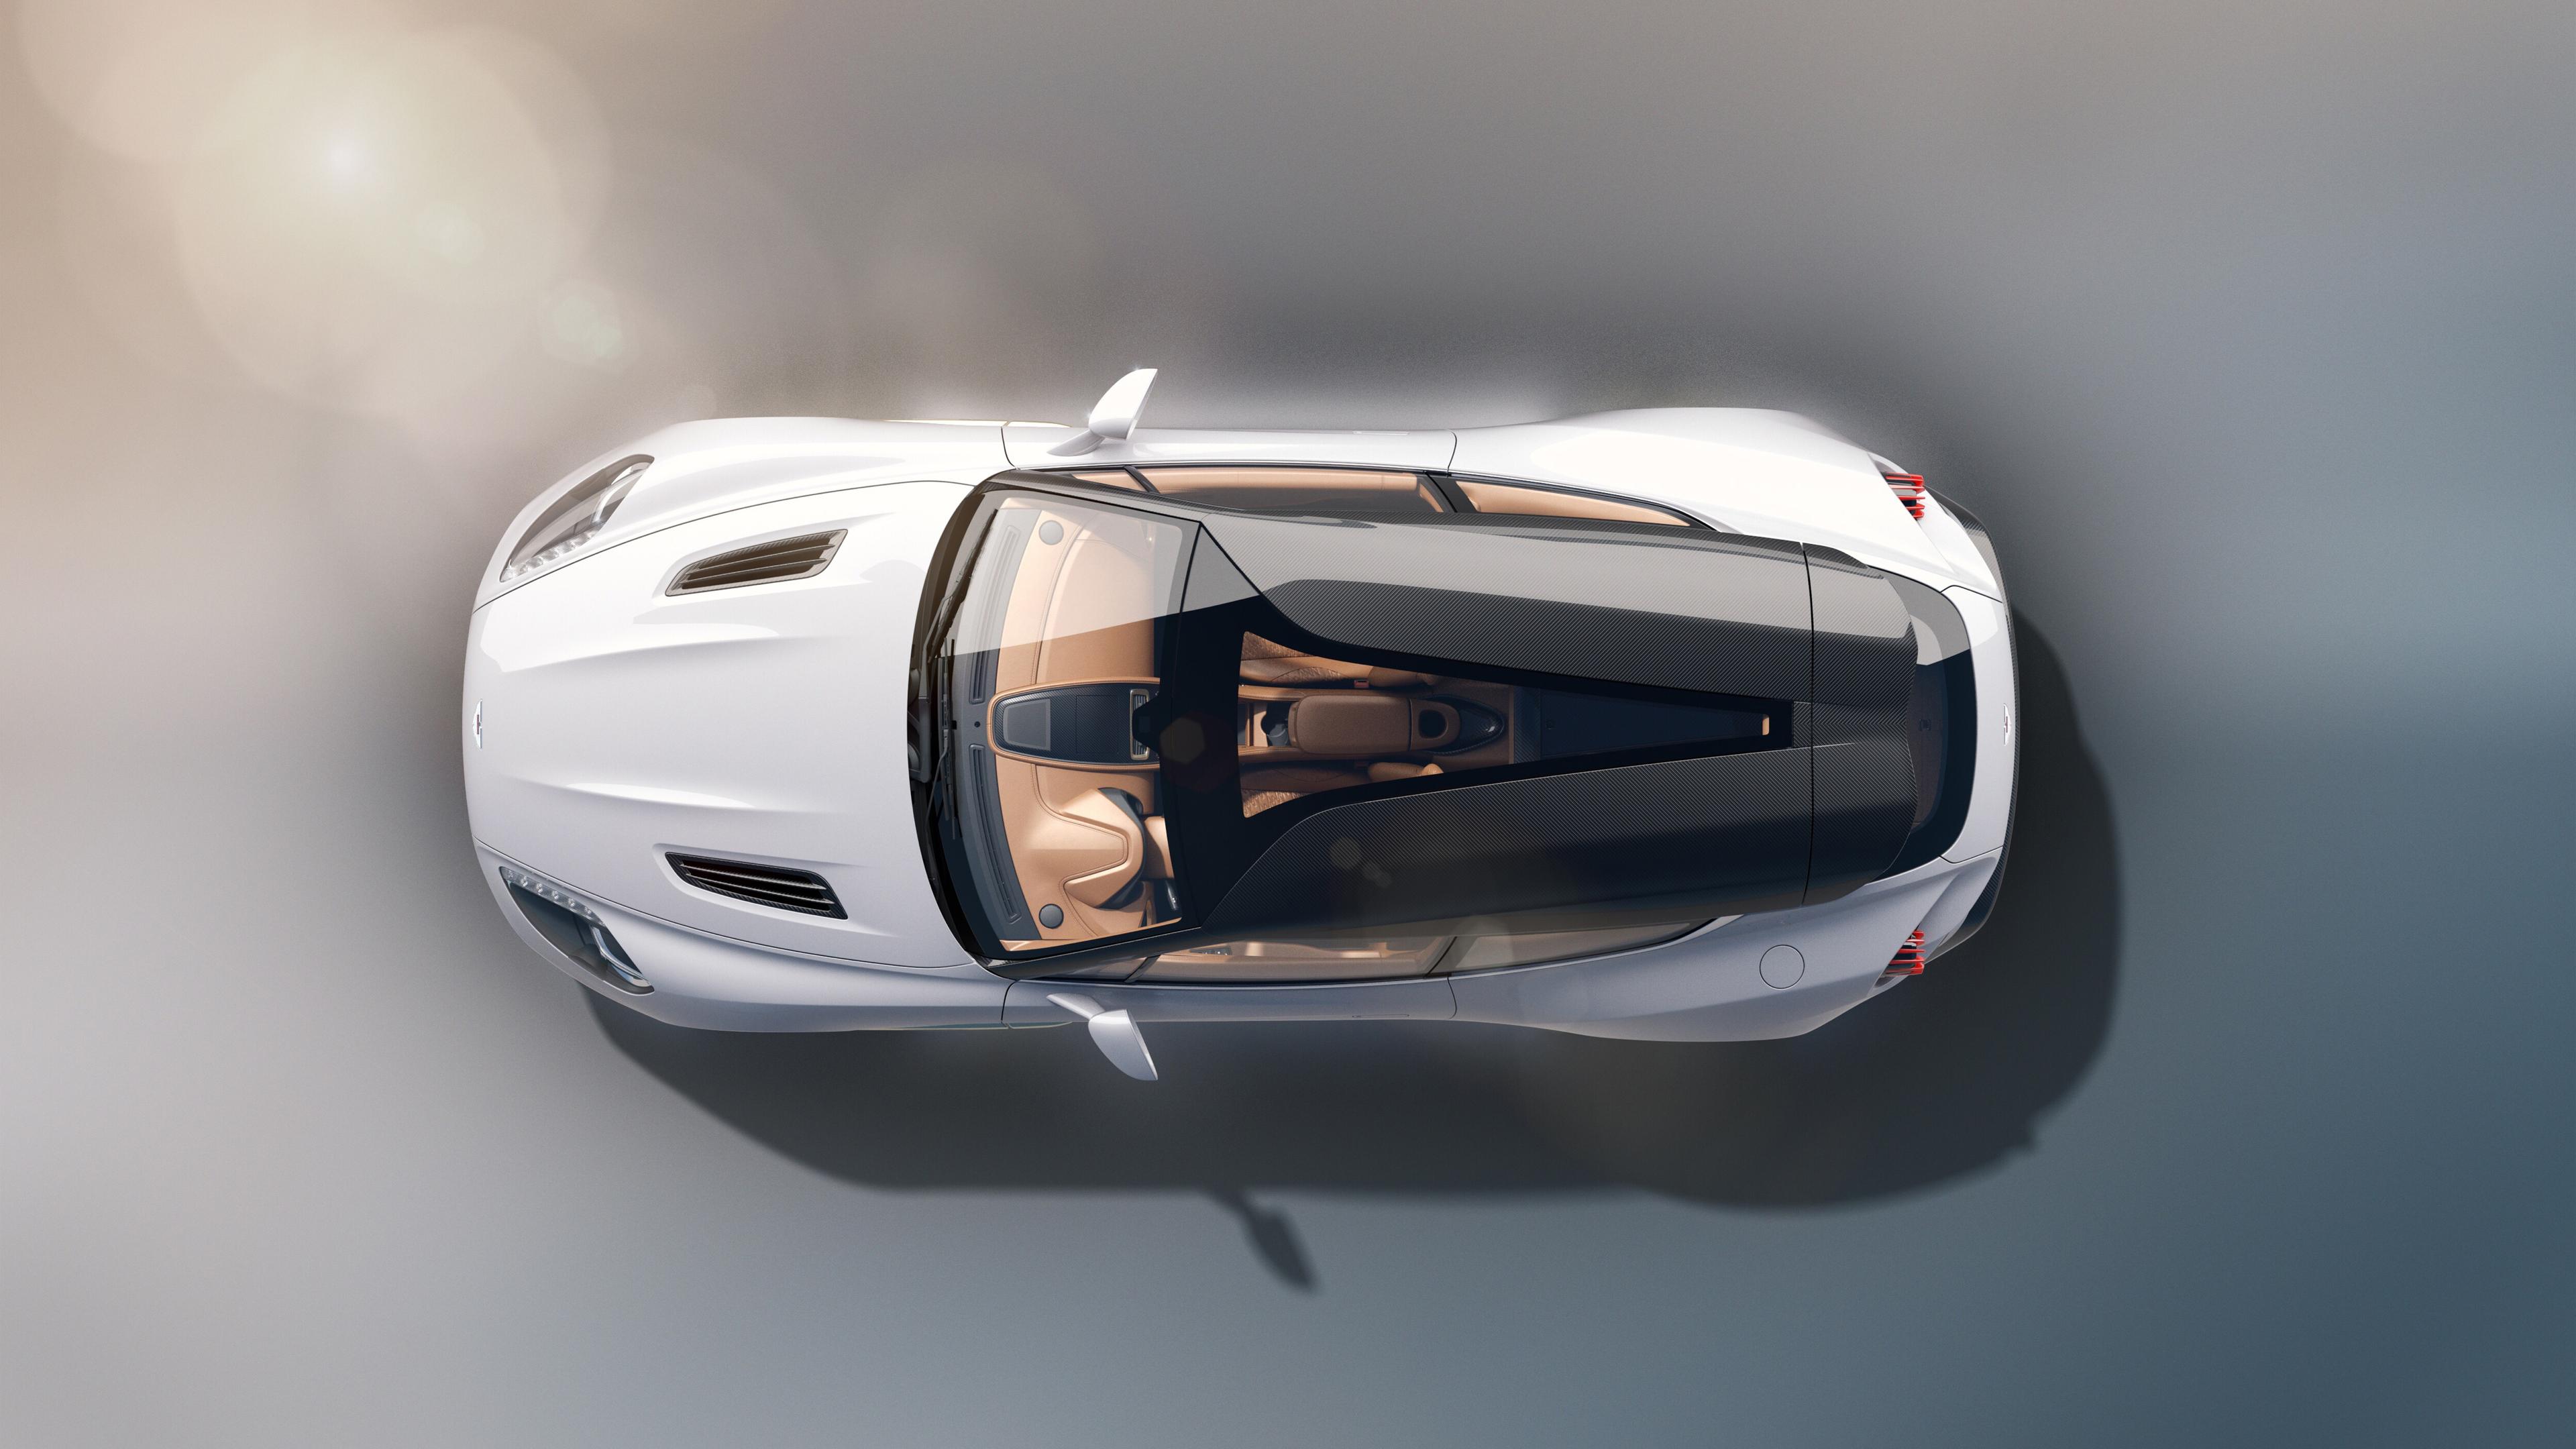 Aston Martin Vanquish Zagato Wallpaper The Best Hd Wallpaper